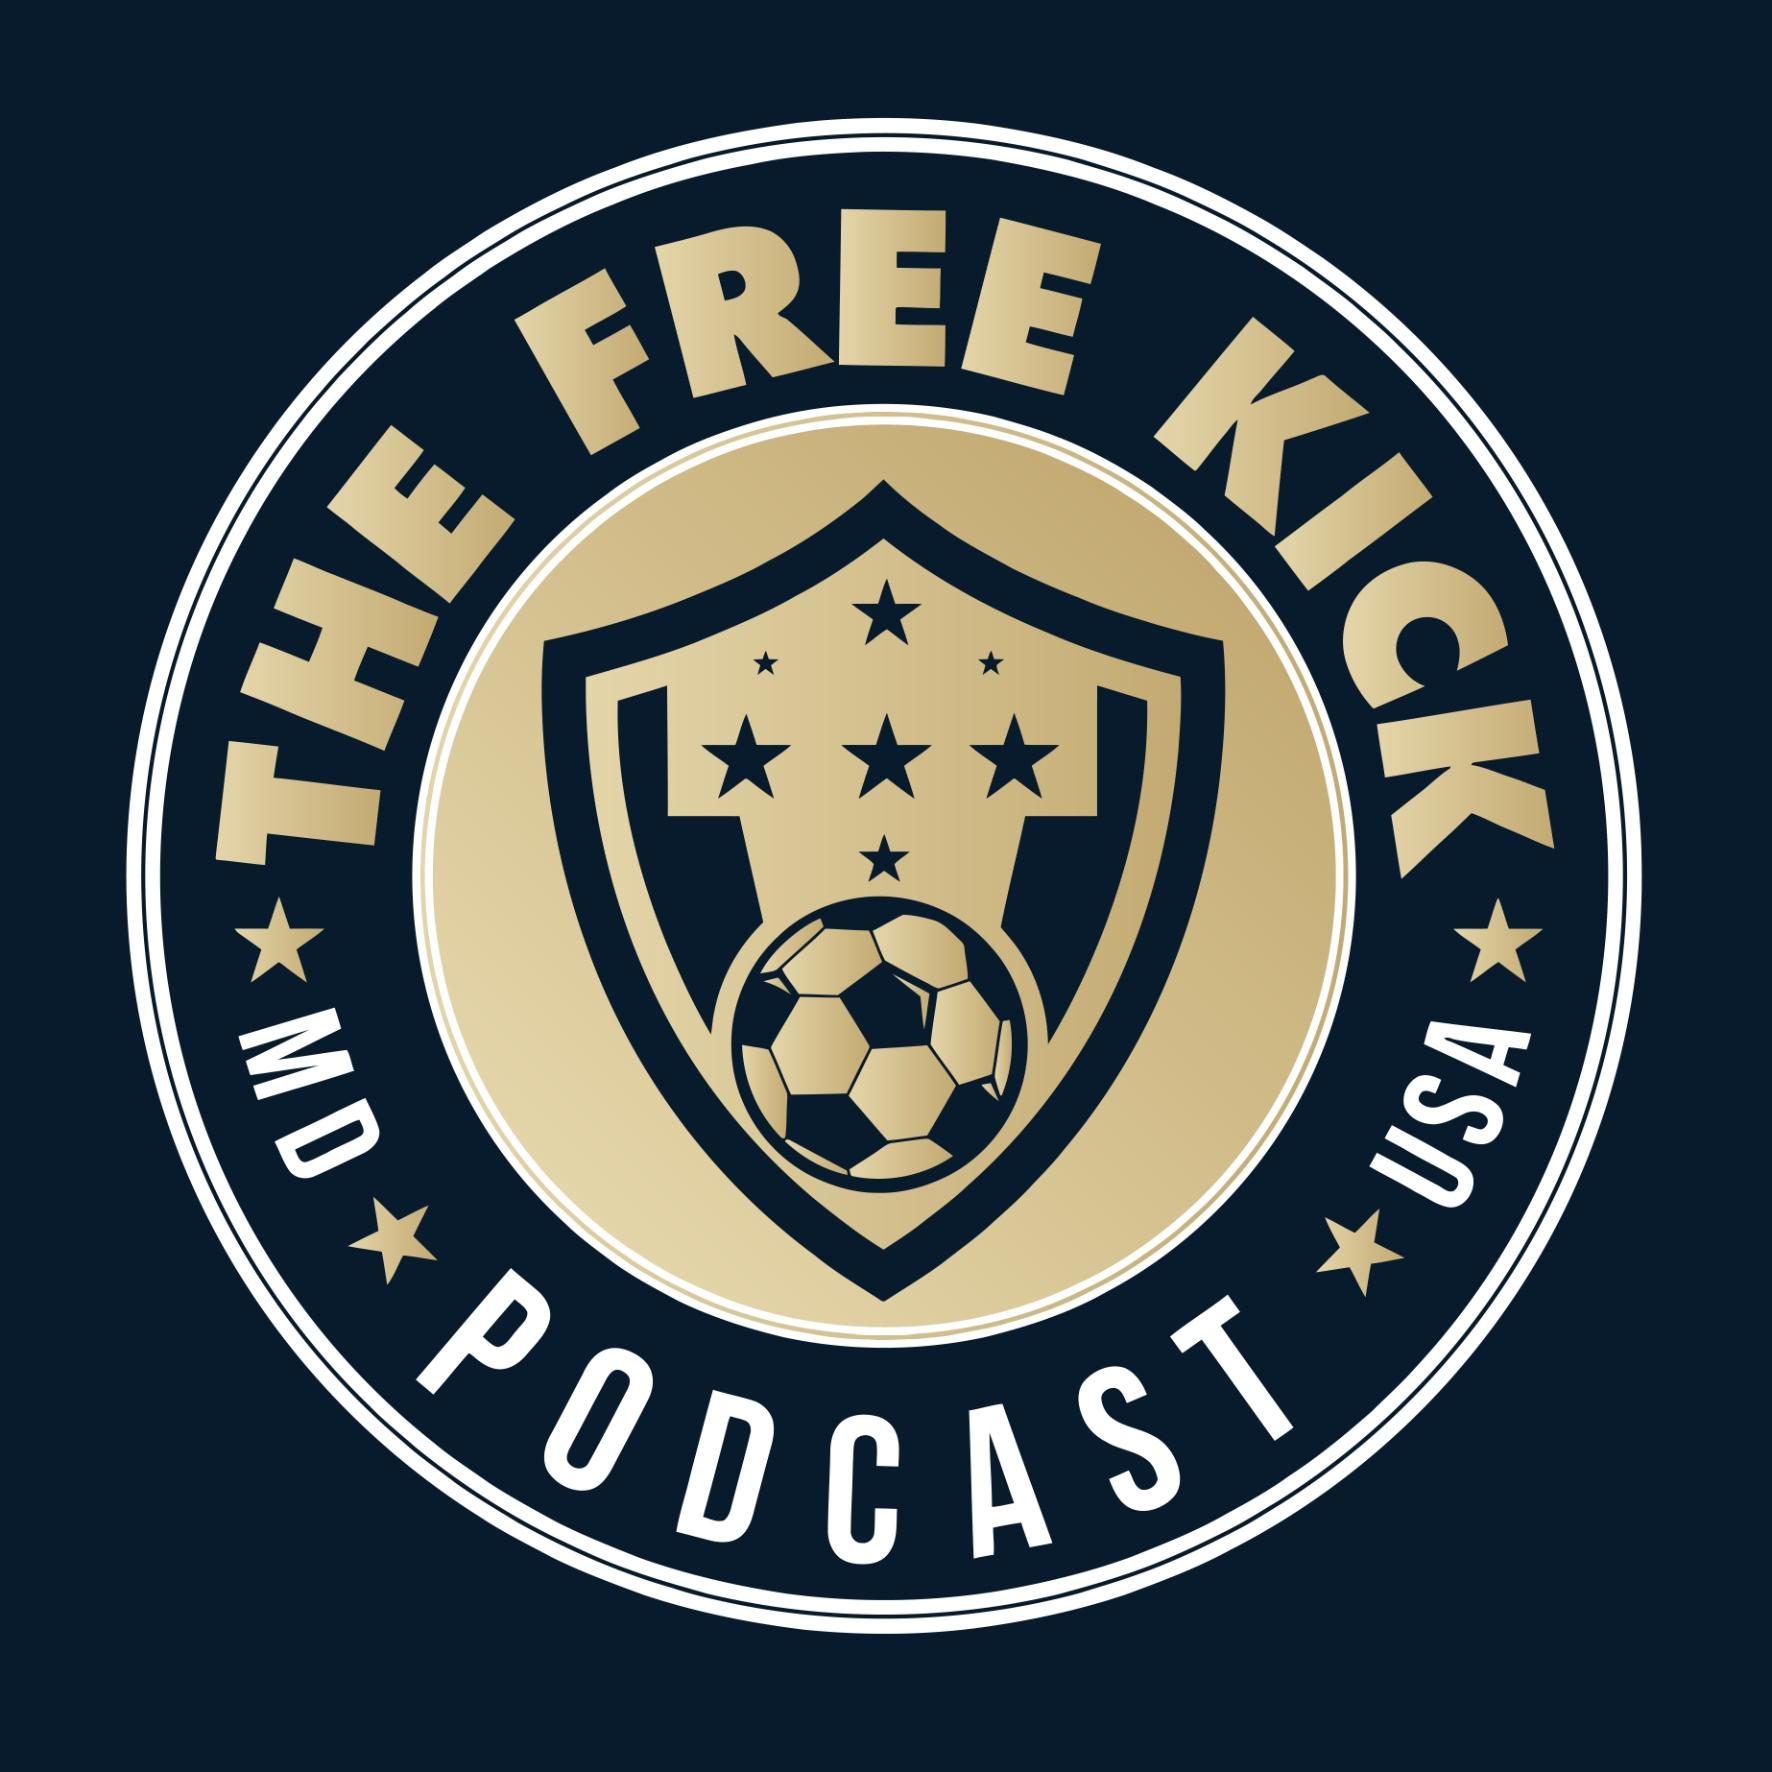 The Free Kick show art